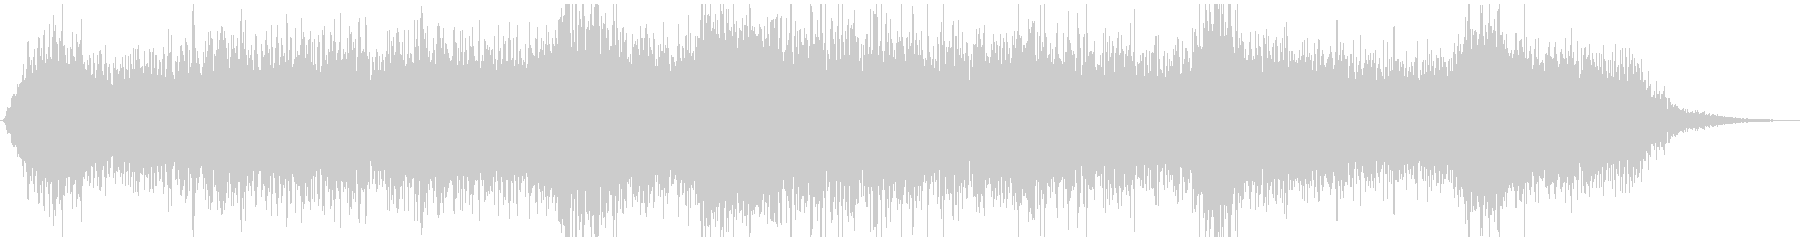 PADS リフトオフ01の未再生の波形